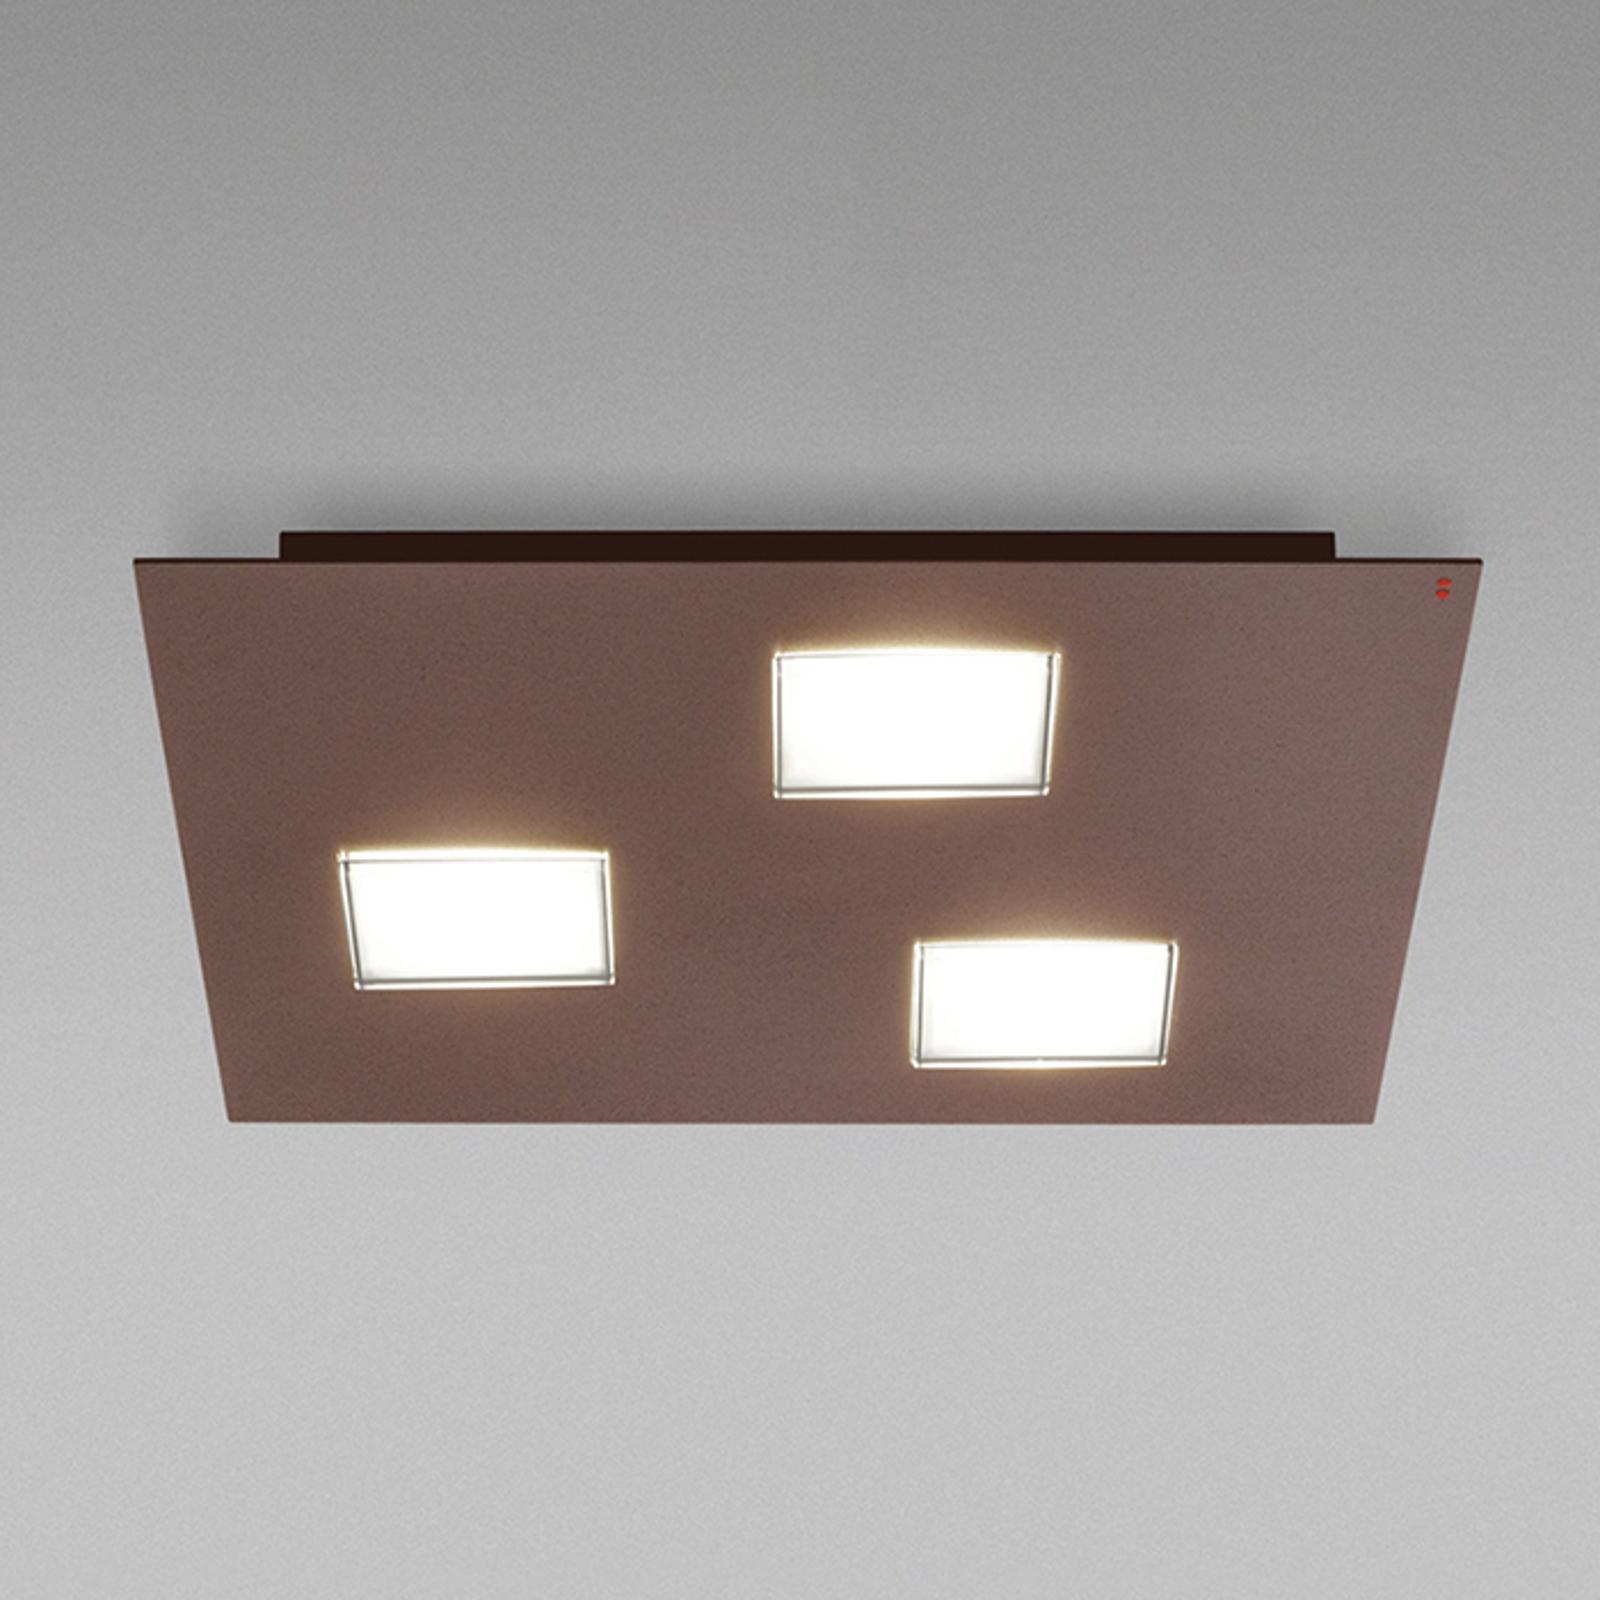 Brązowa lampa sufitowa LED Quarter, 3 LED